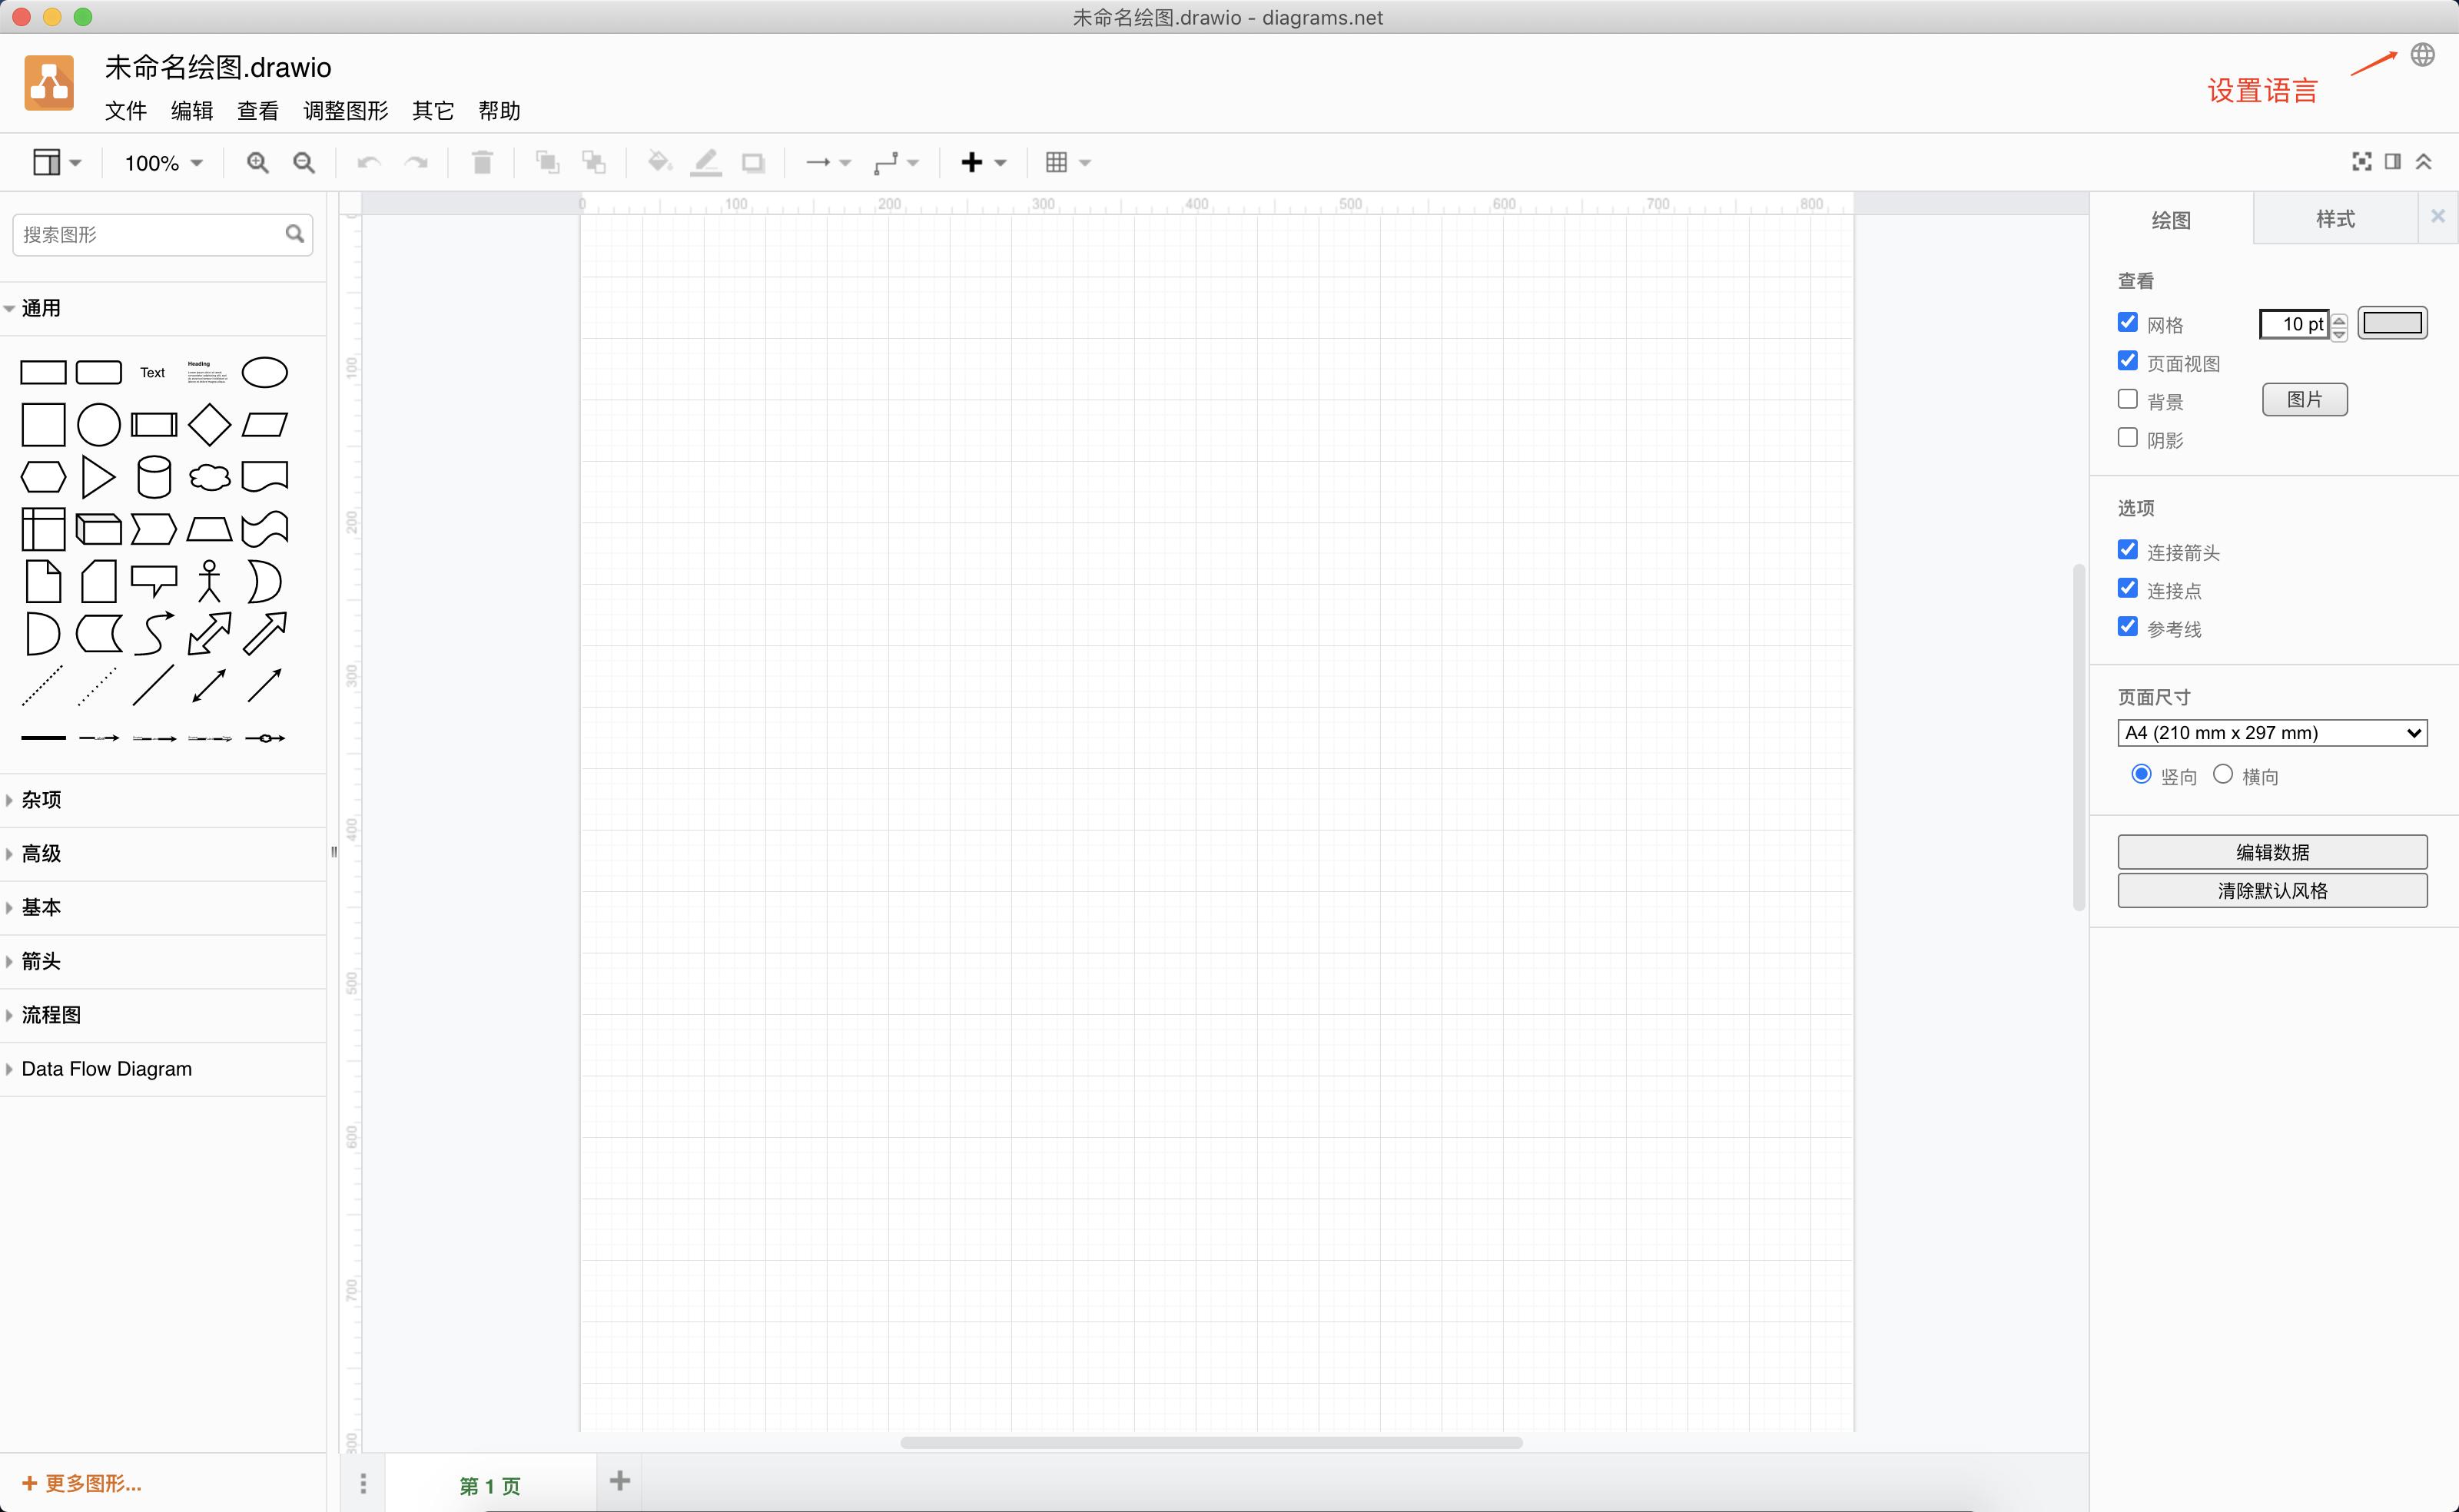 drawio-desktop-2-qmJ3XA